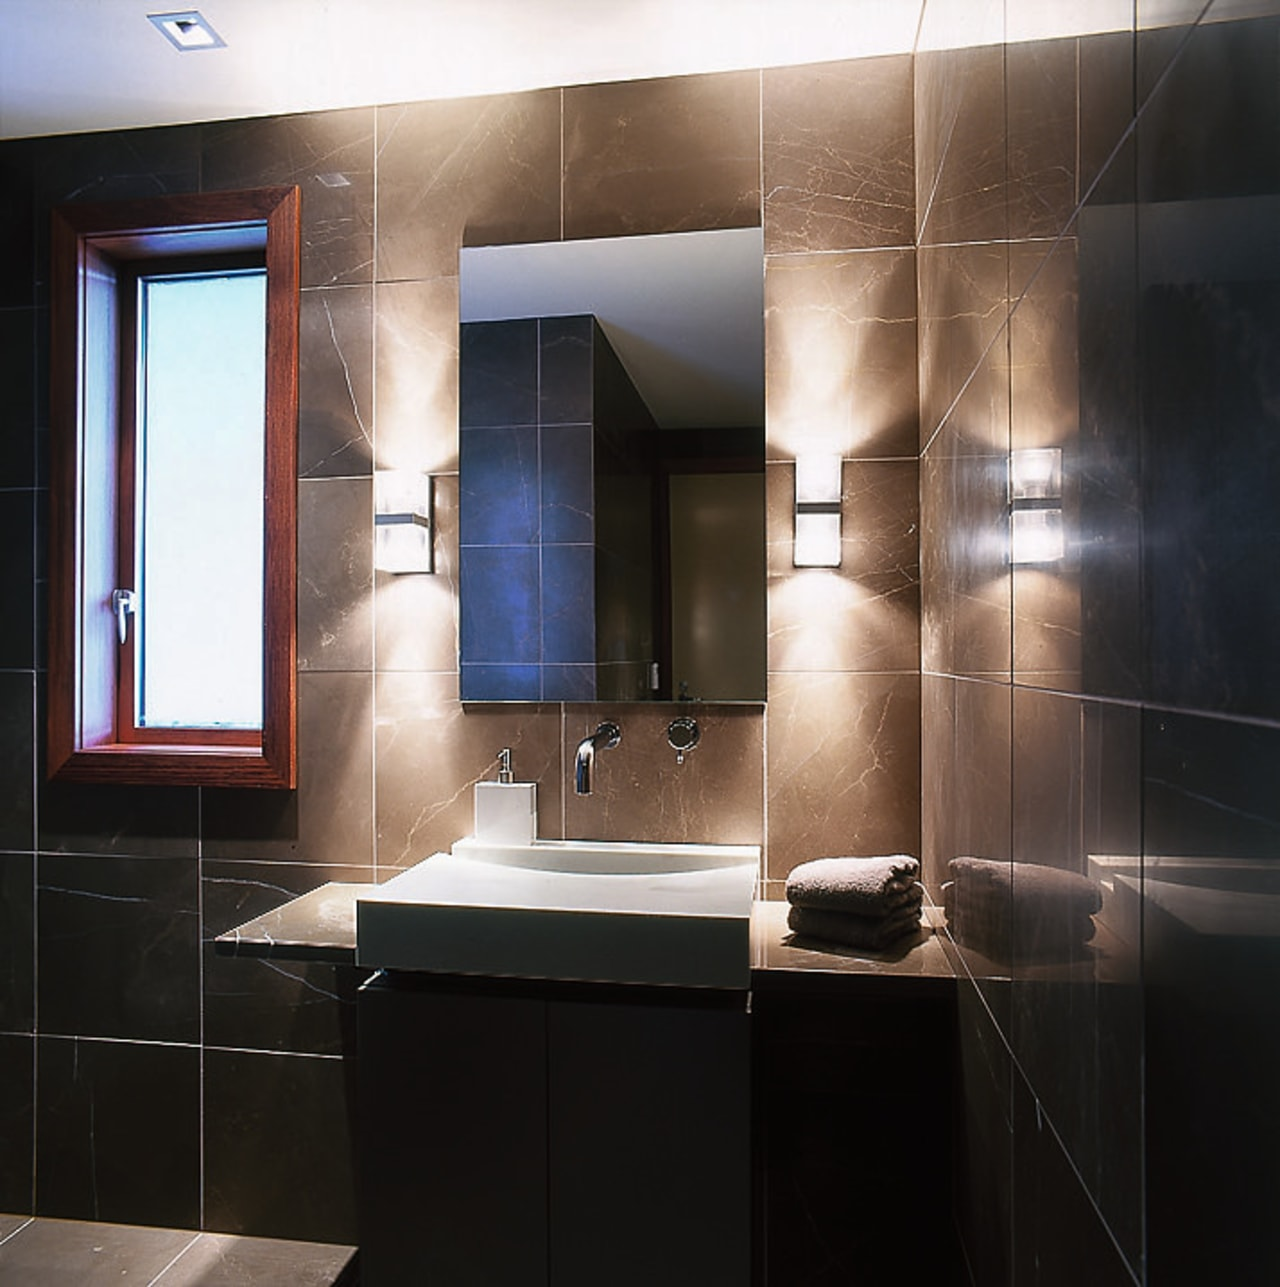 View of the vanity unit in the bathroom bathroom, bathroom accessory, cabinetry, countertop, interior design, room, sink, black